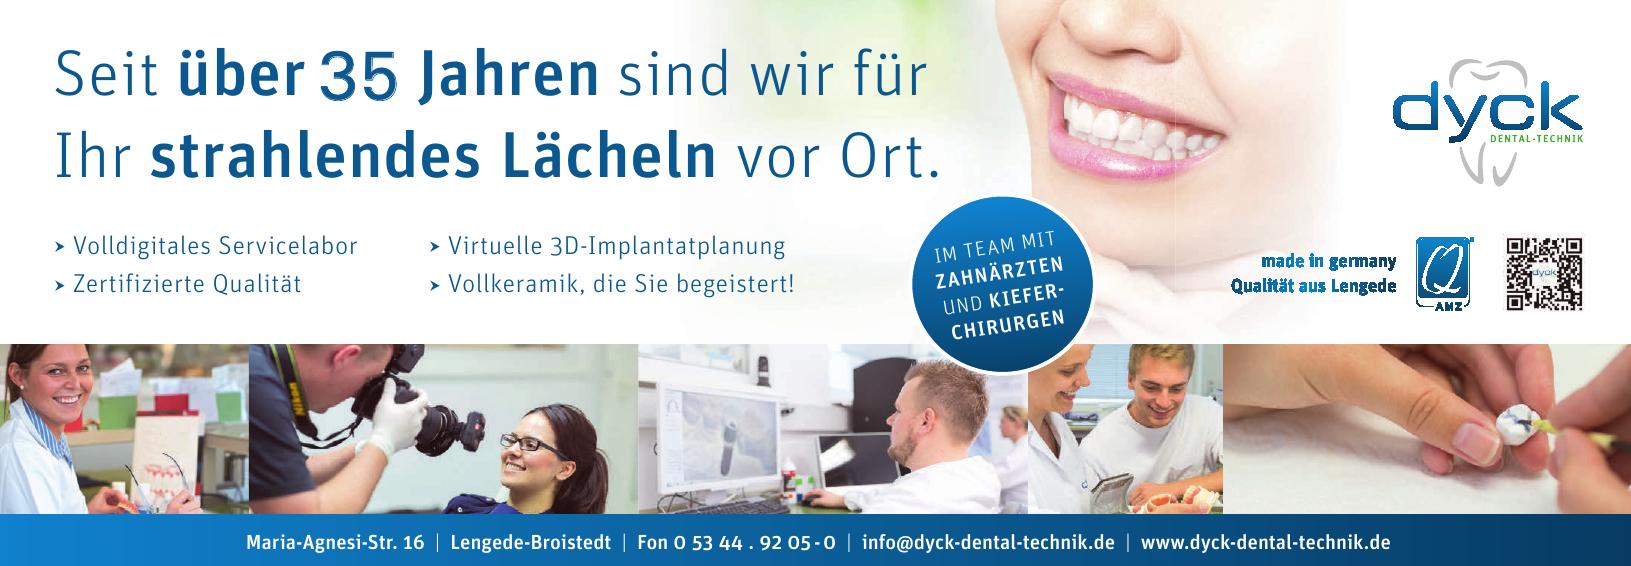 Dyck Dental-Technik